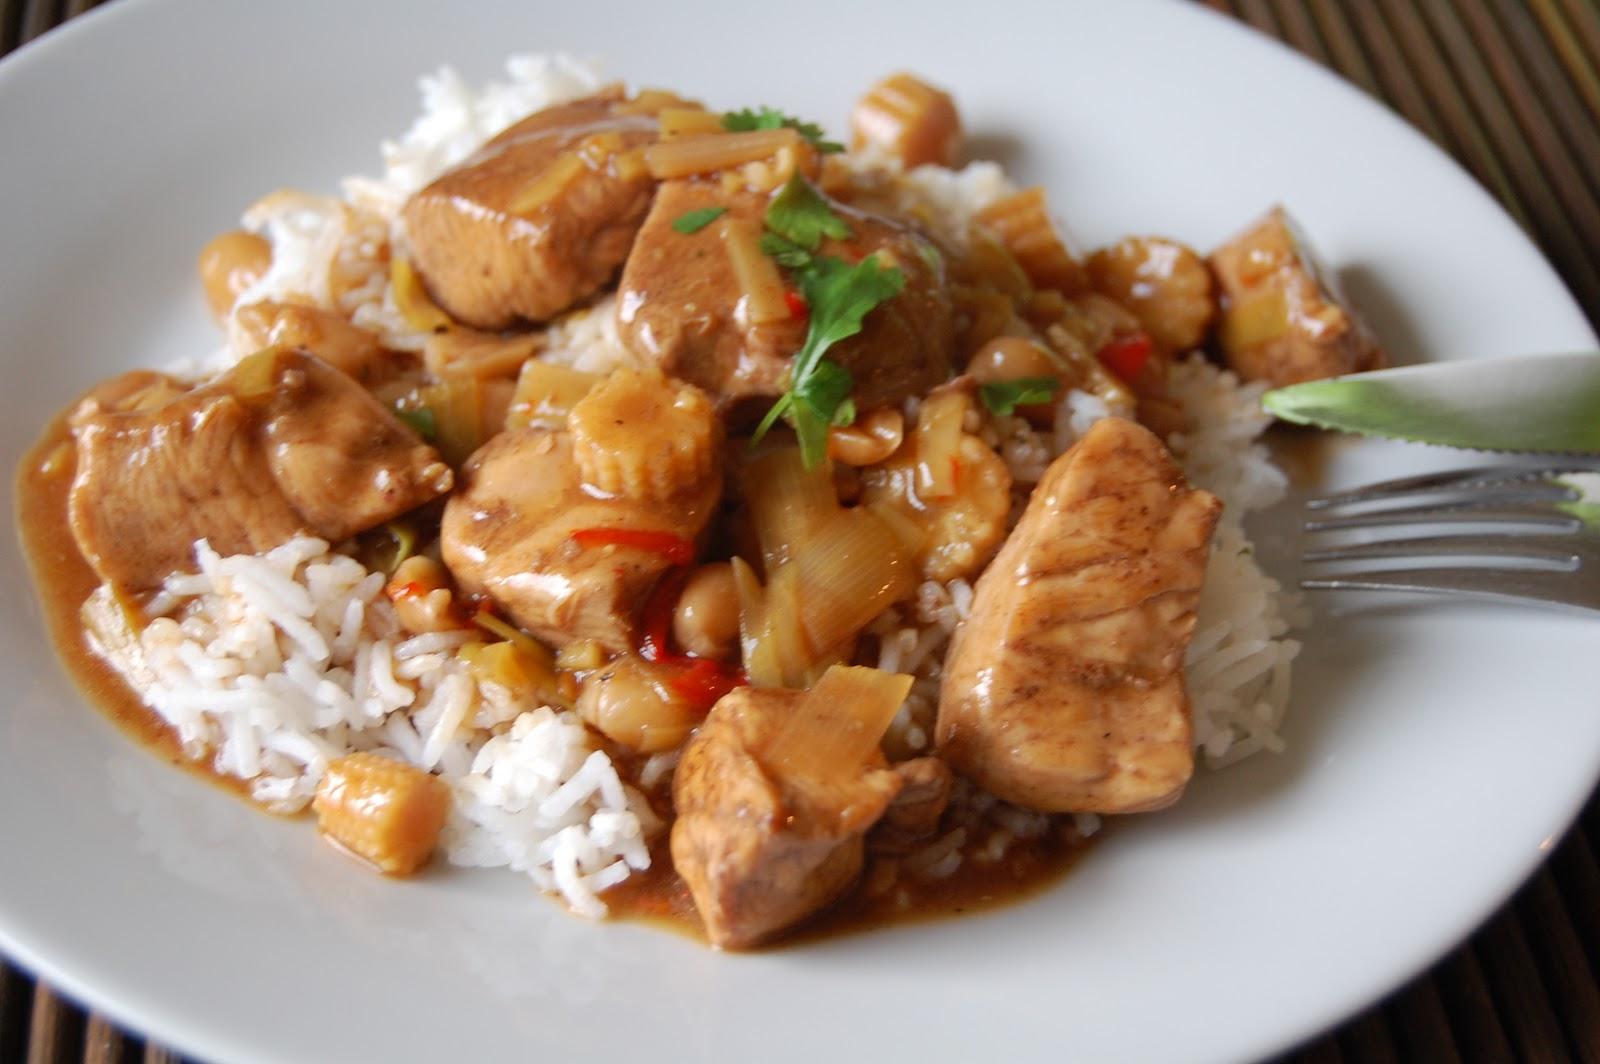 Saras madunivers: Kung Pao kylling (krydret kylling med peanuts)